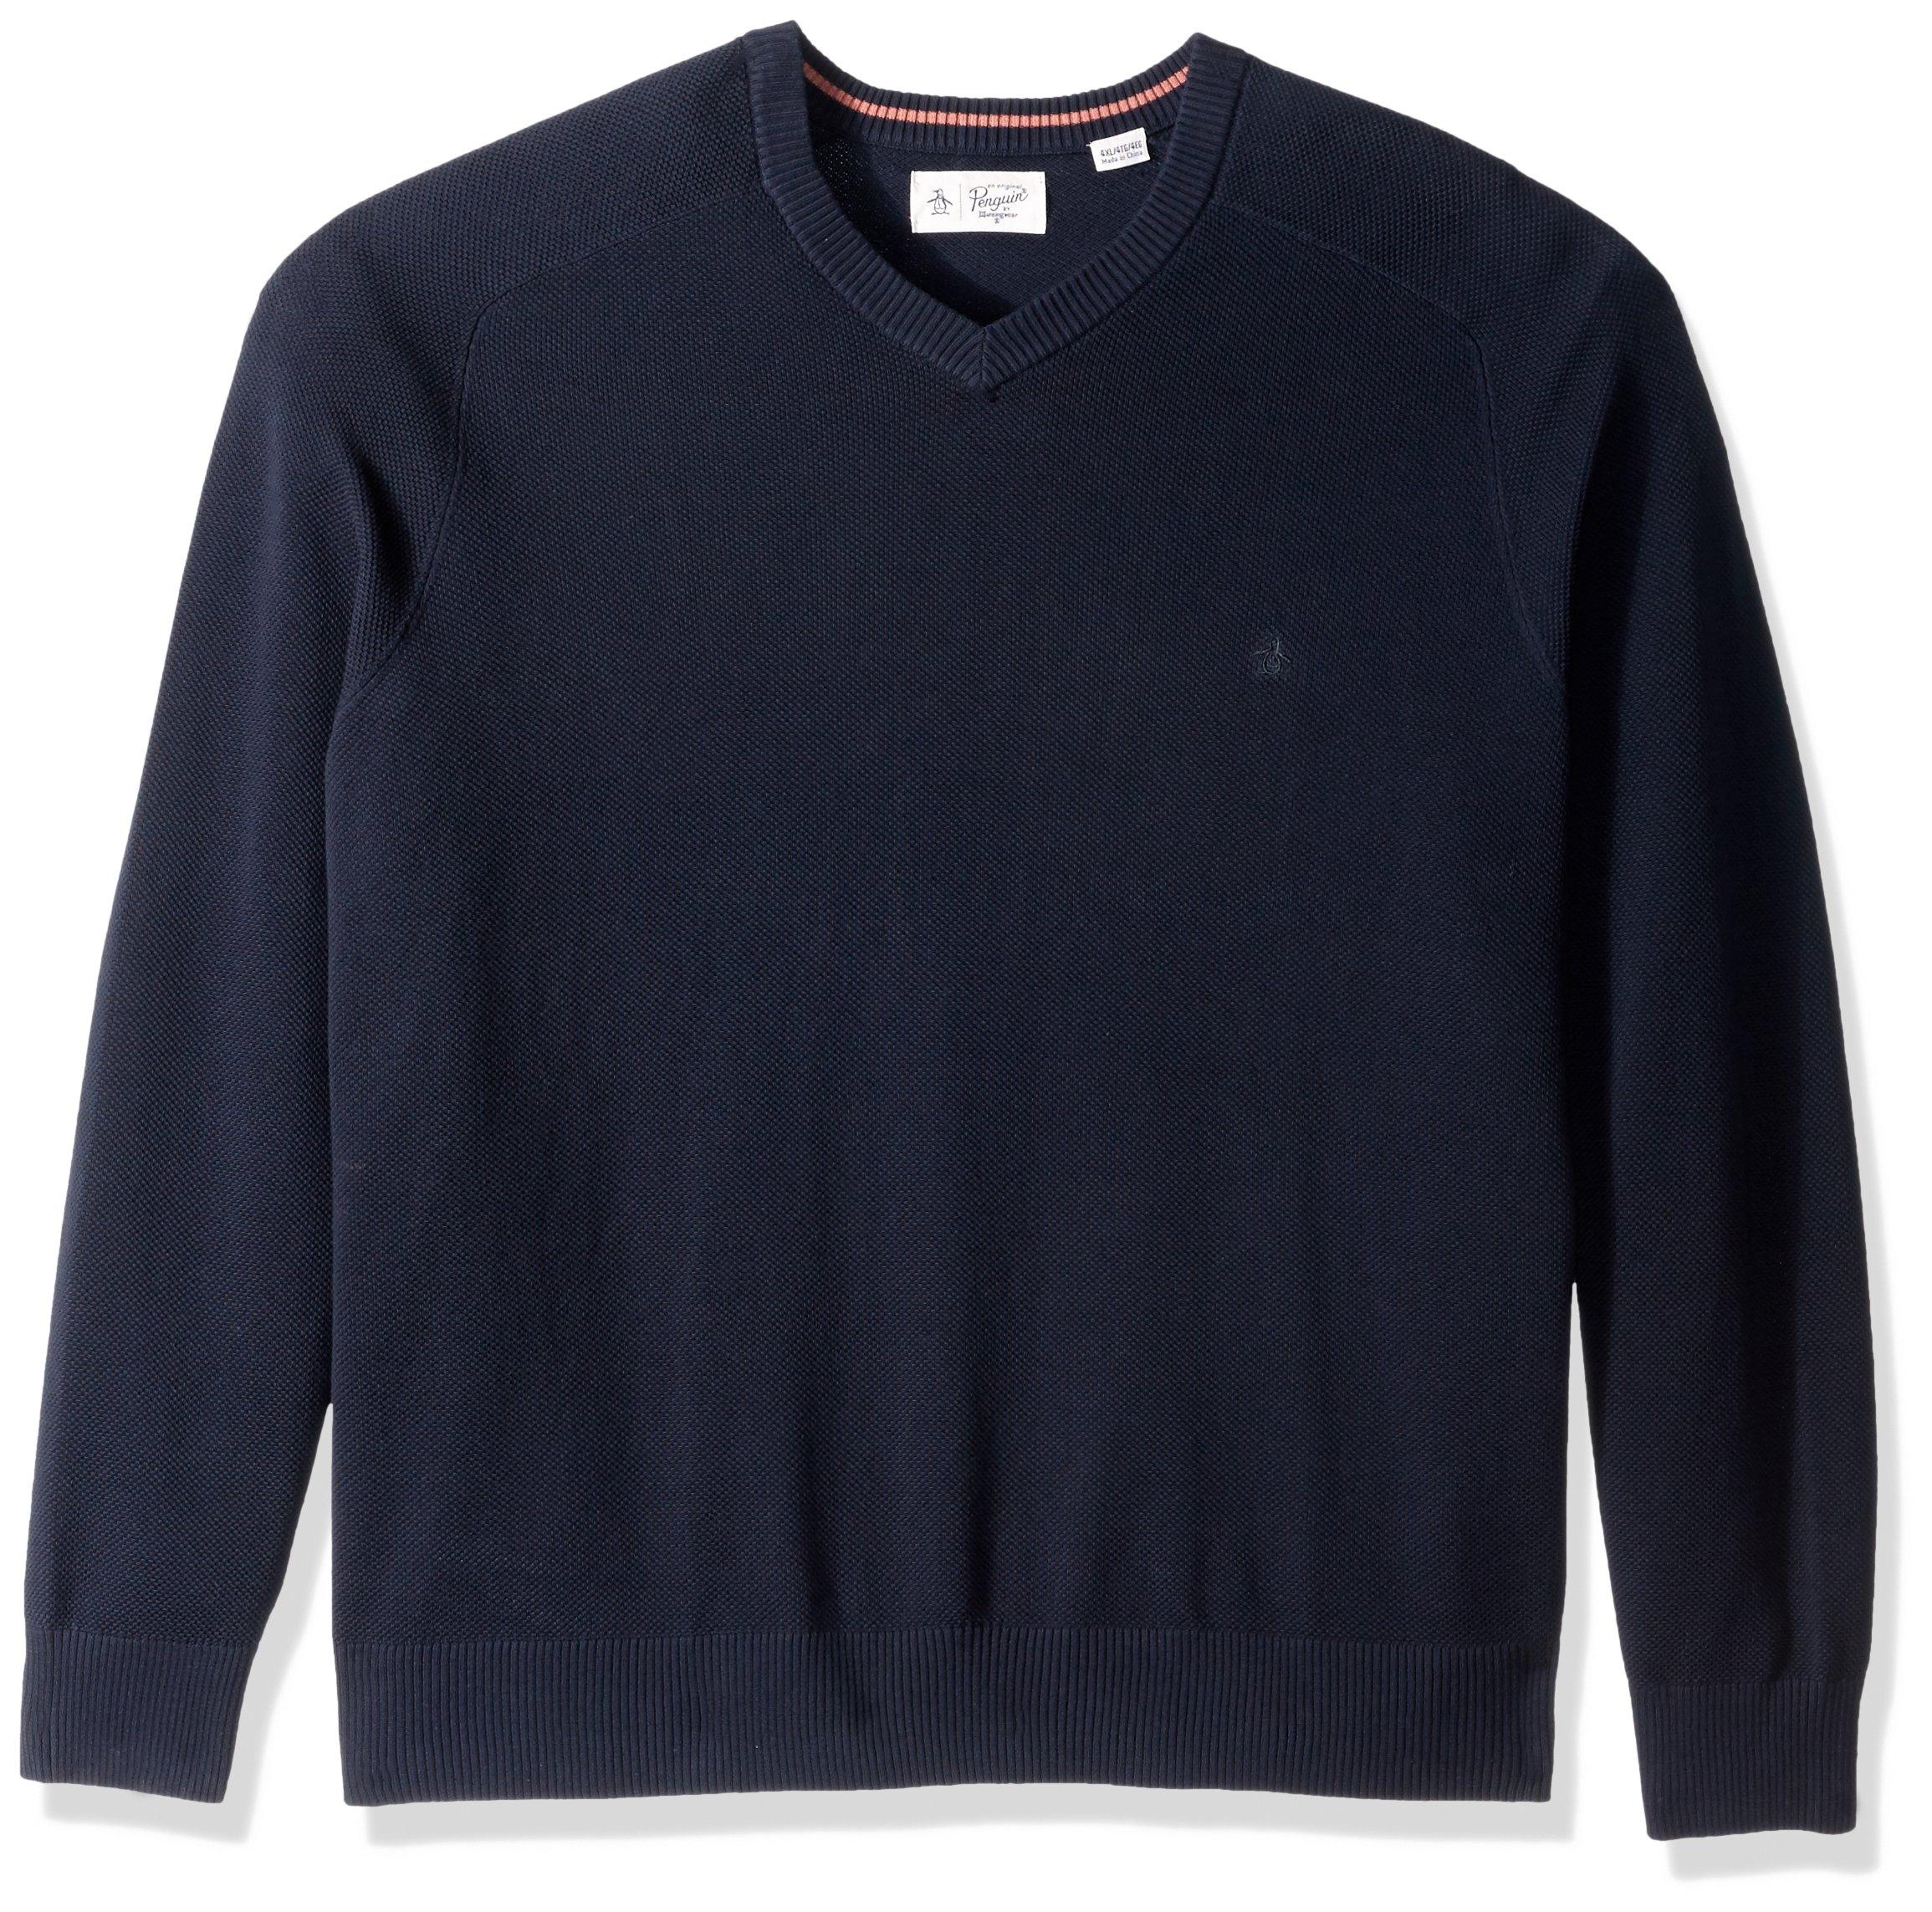 Original Penguin Men's Big and Tall Honeycomb V-Neck Sweater, Dark Sapphire, 1 XL-Extra Large